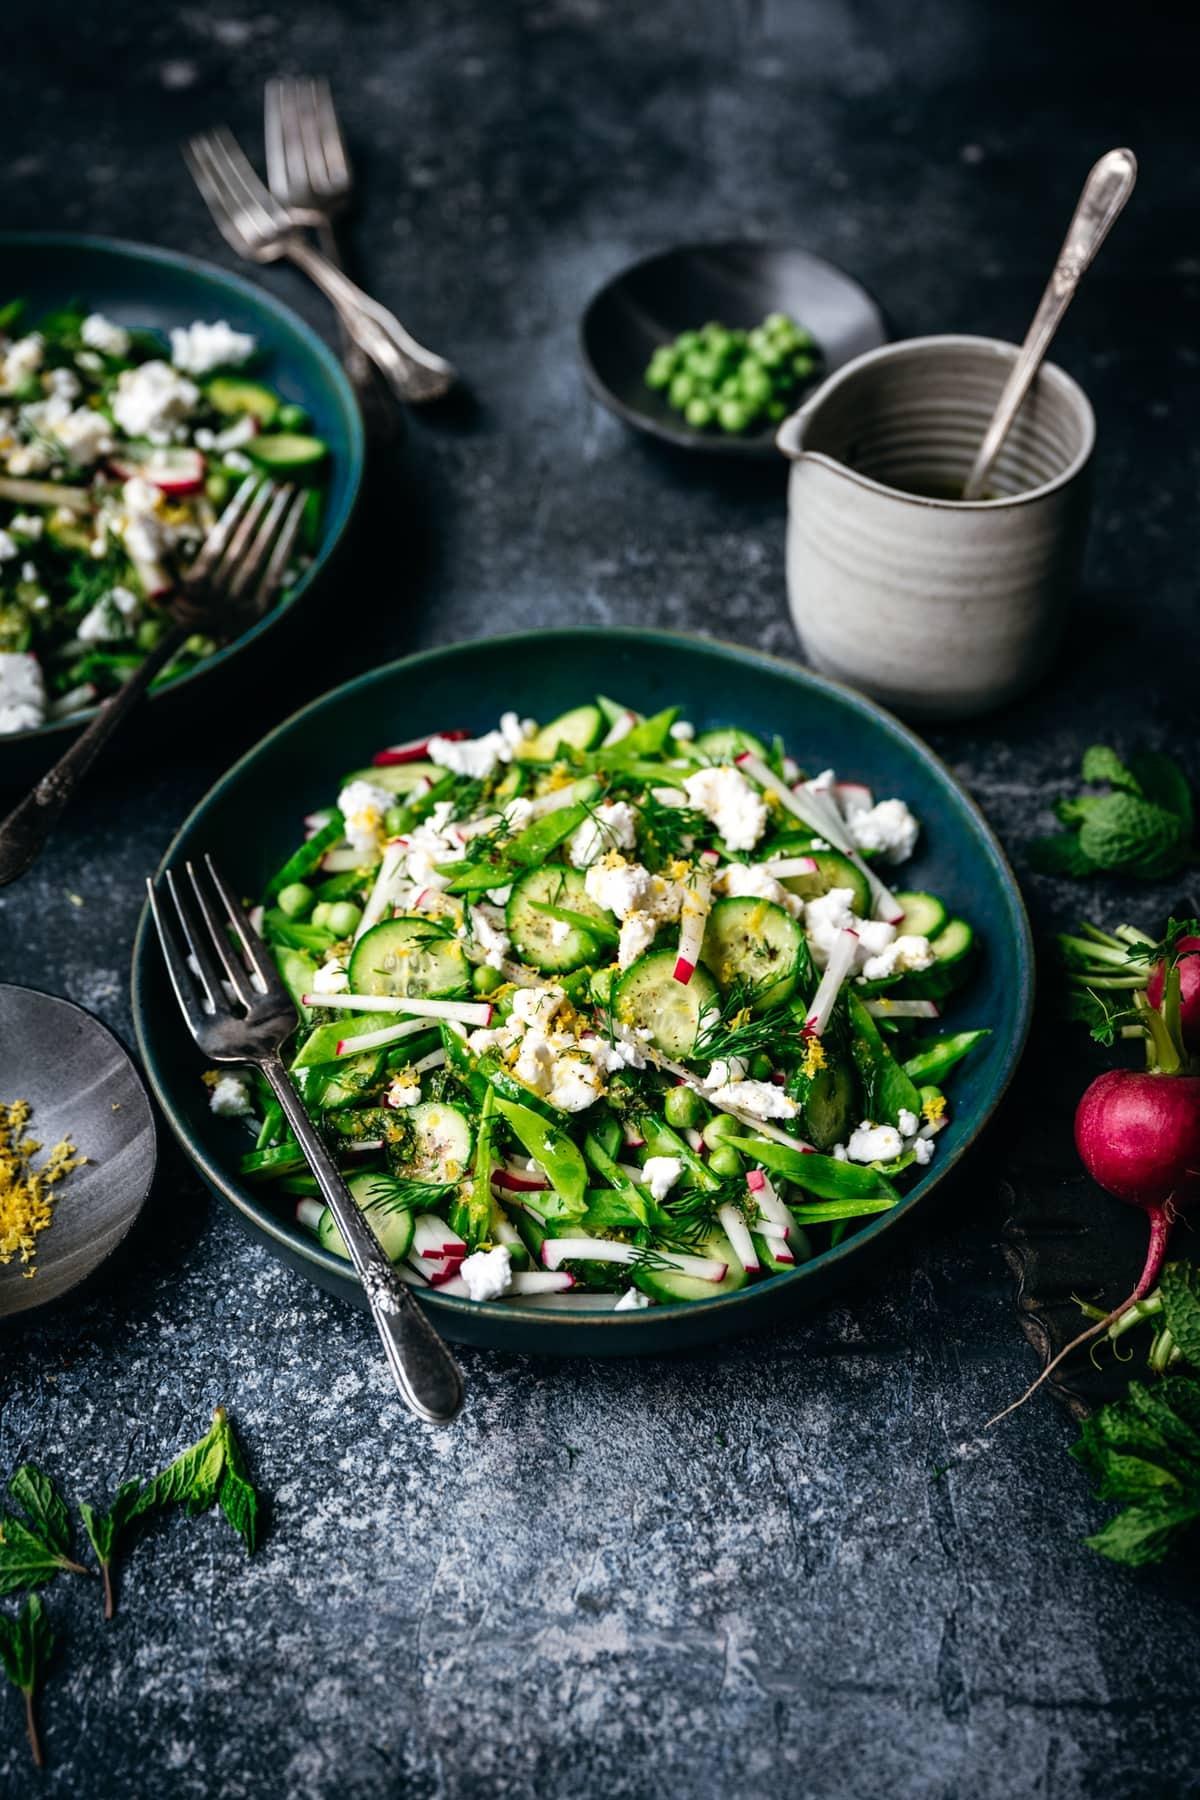 side view of fresh snow pea and radish salad with lemon herb vinaigrette